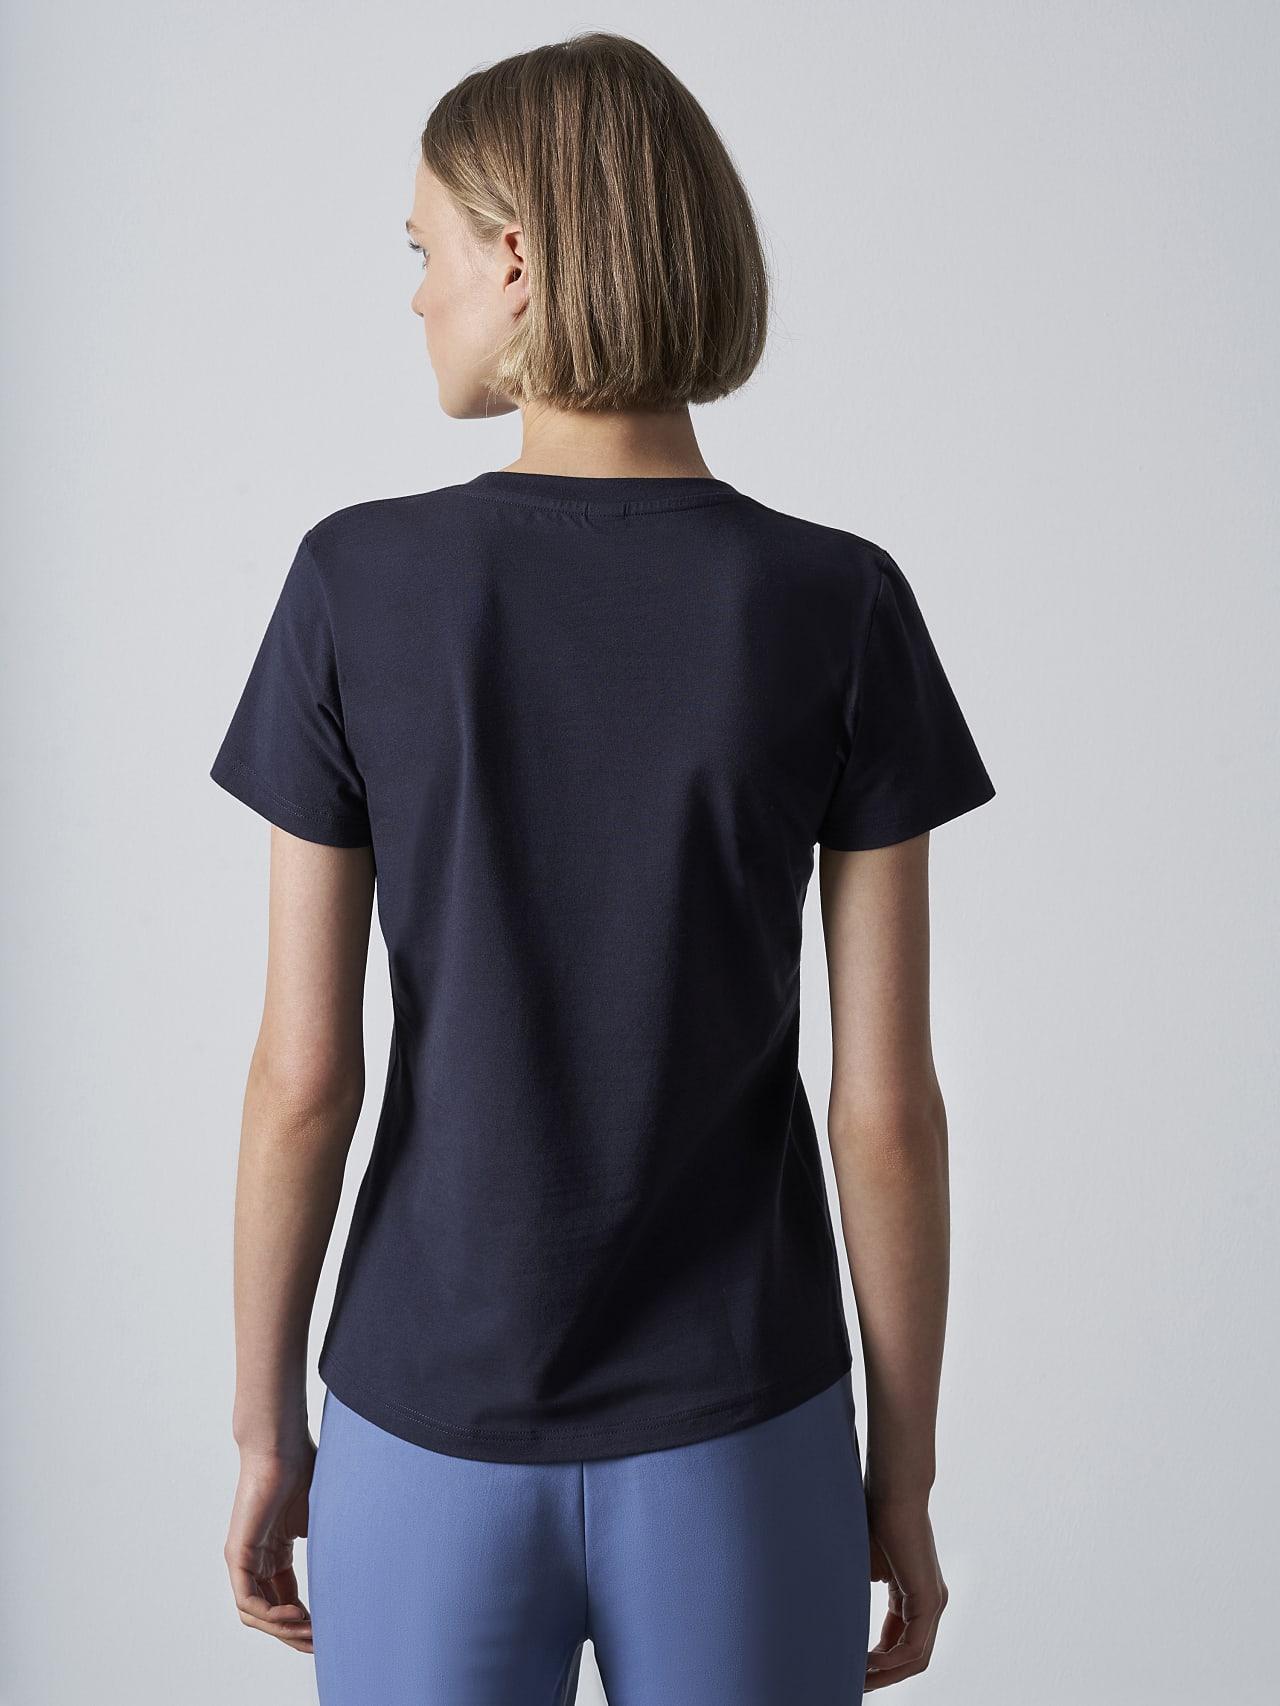 JANPA V1.Y5.02 Logo Print T-Shirt navy Front Main Alpha Tauri